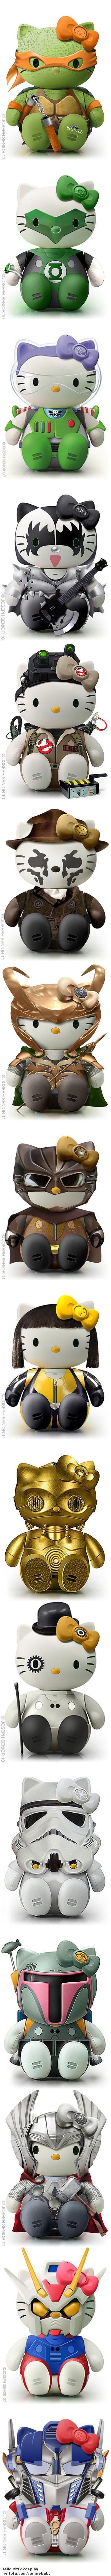 Hello Kitty cosplay